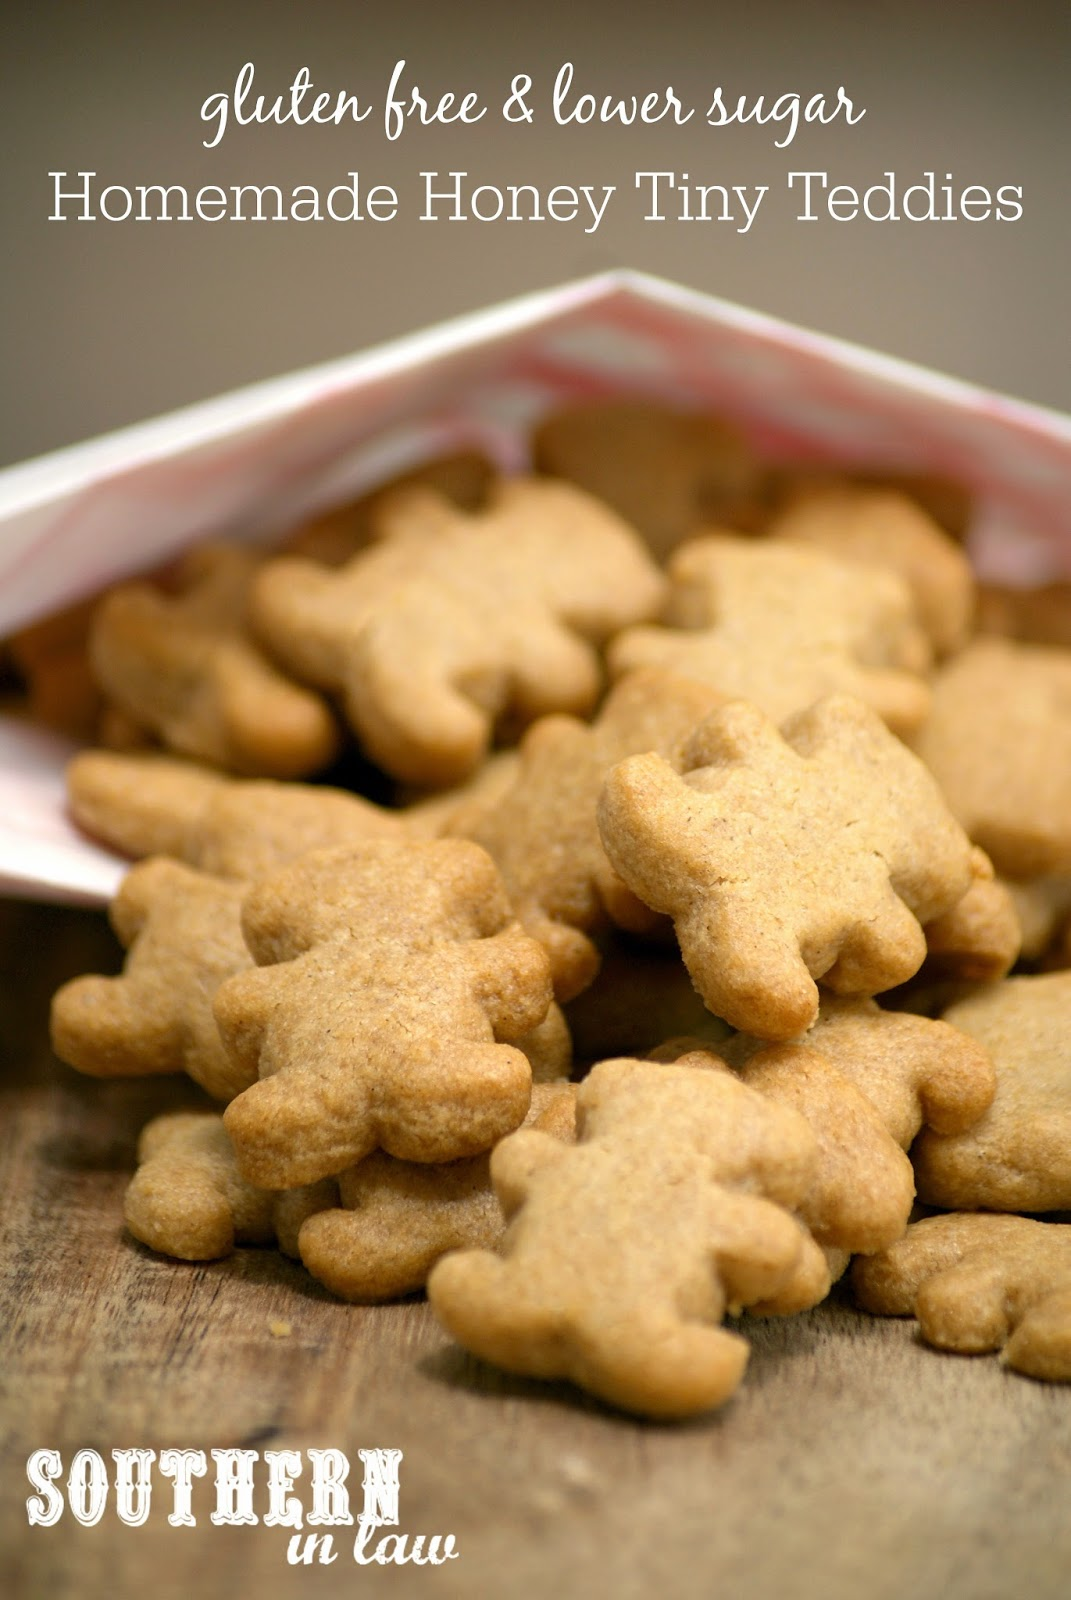 Healthy Honey Tiny Teddies Recipe - gluten free, nut free, egg free, healthy, low sugar